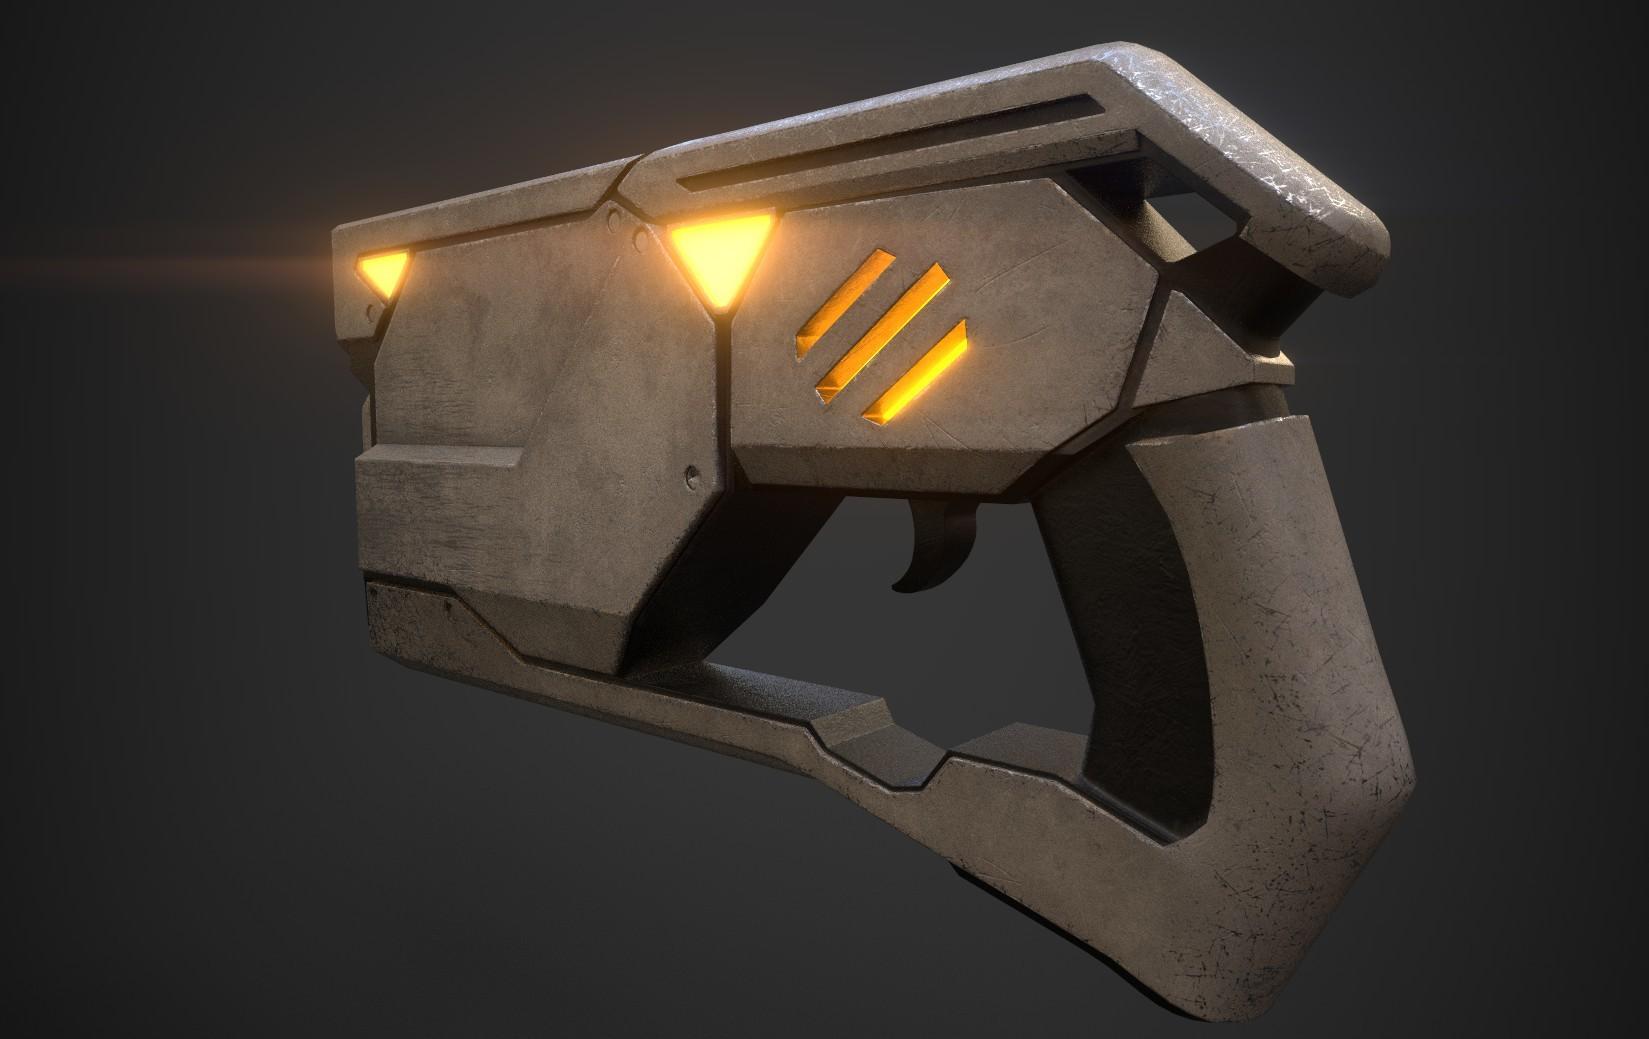 Kevin gillis nagy gun concept new 03